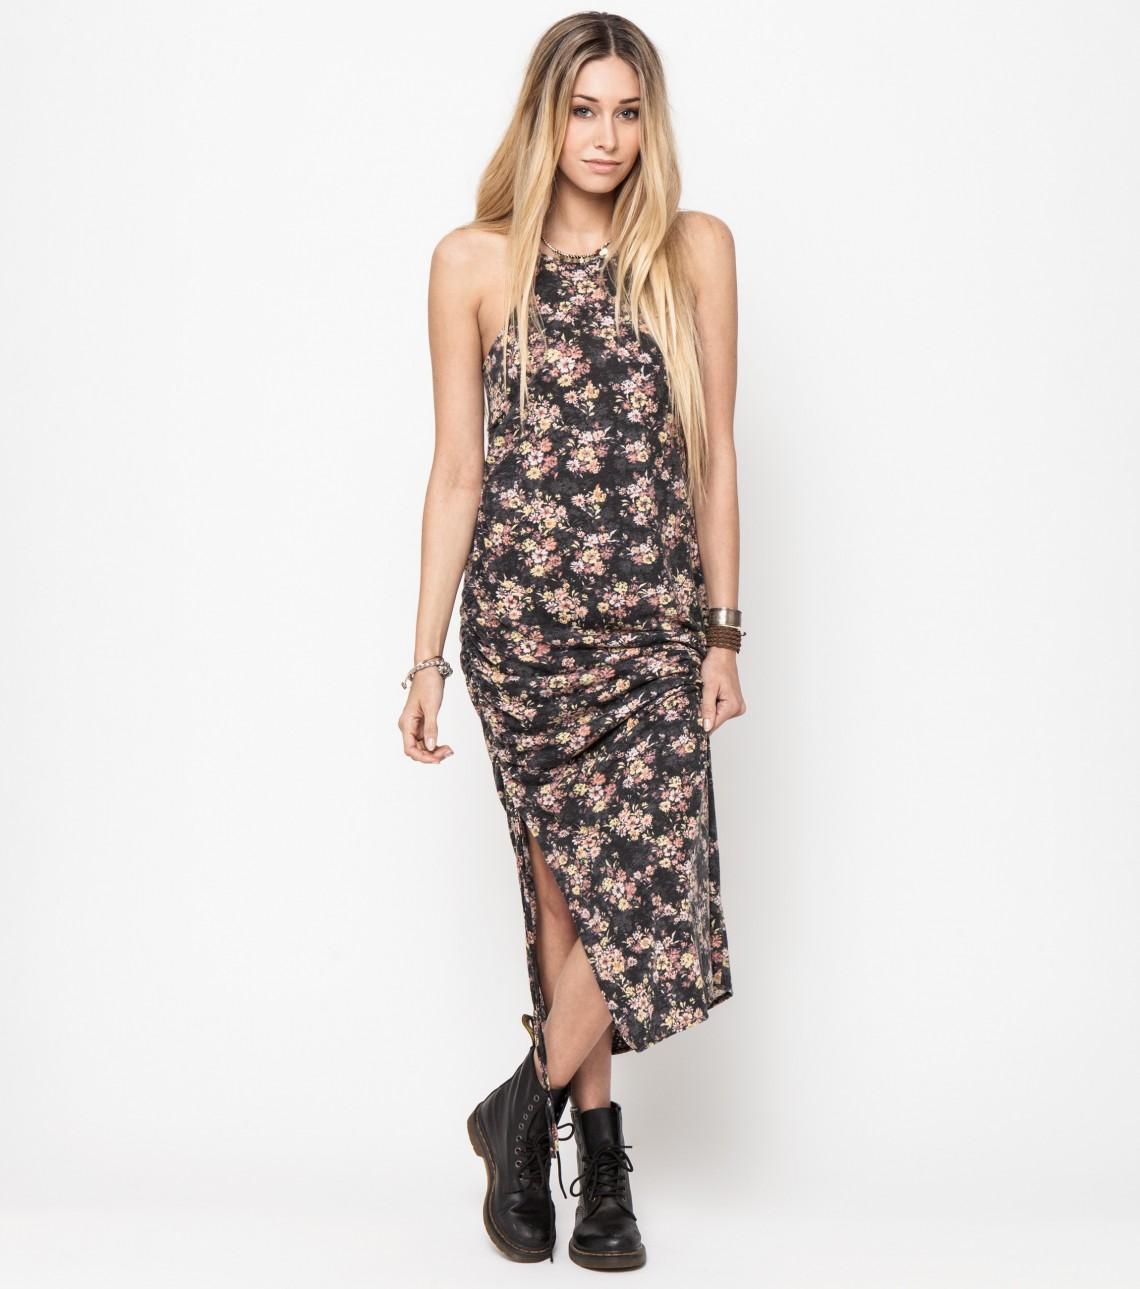 O'Neill ASHTON DRESS from Official US O'Neill Store